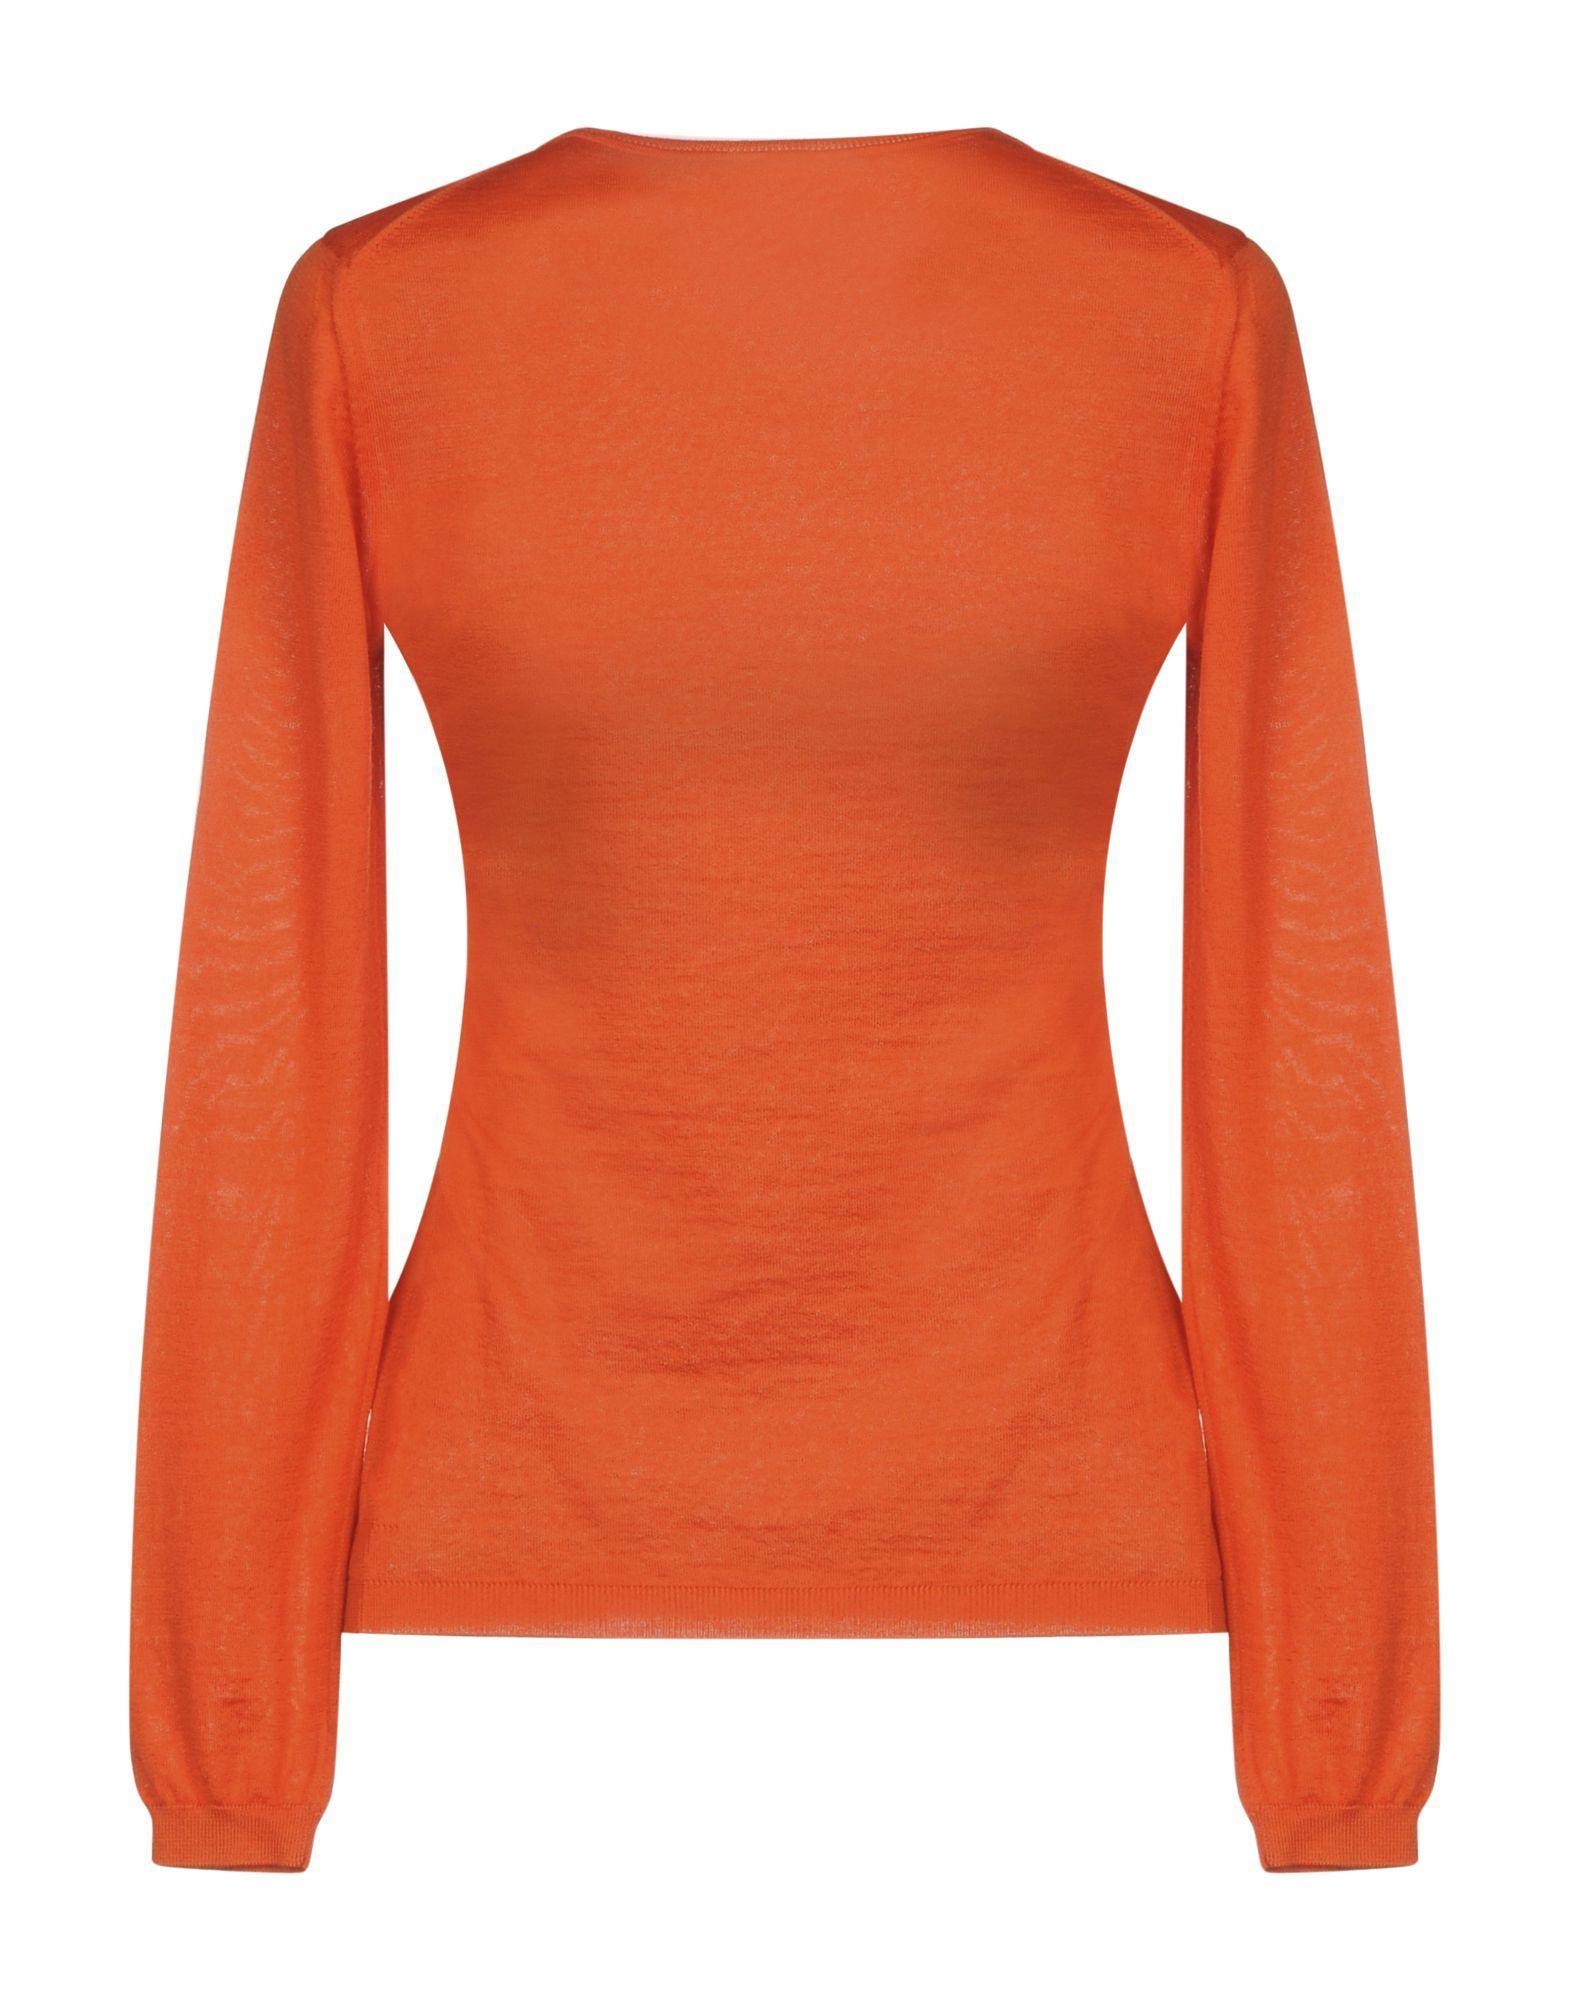 Knitwear Malo Coral Women's Cashmere